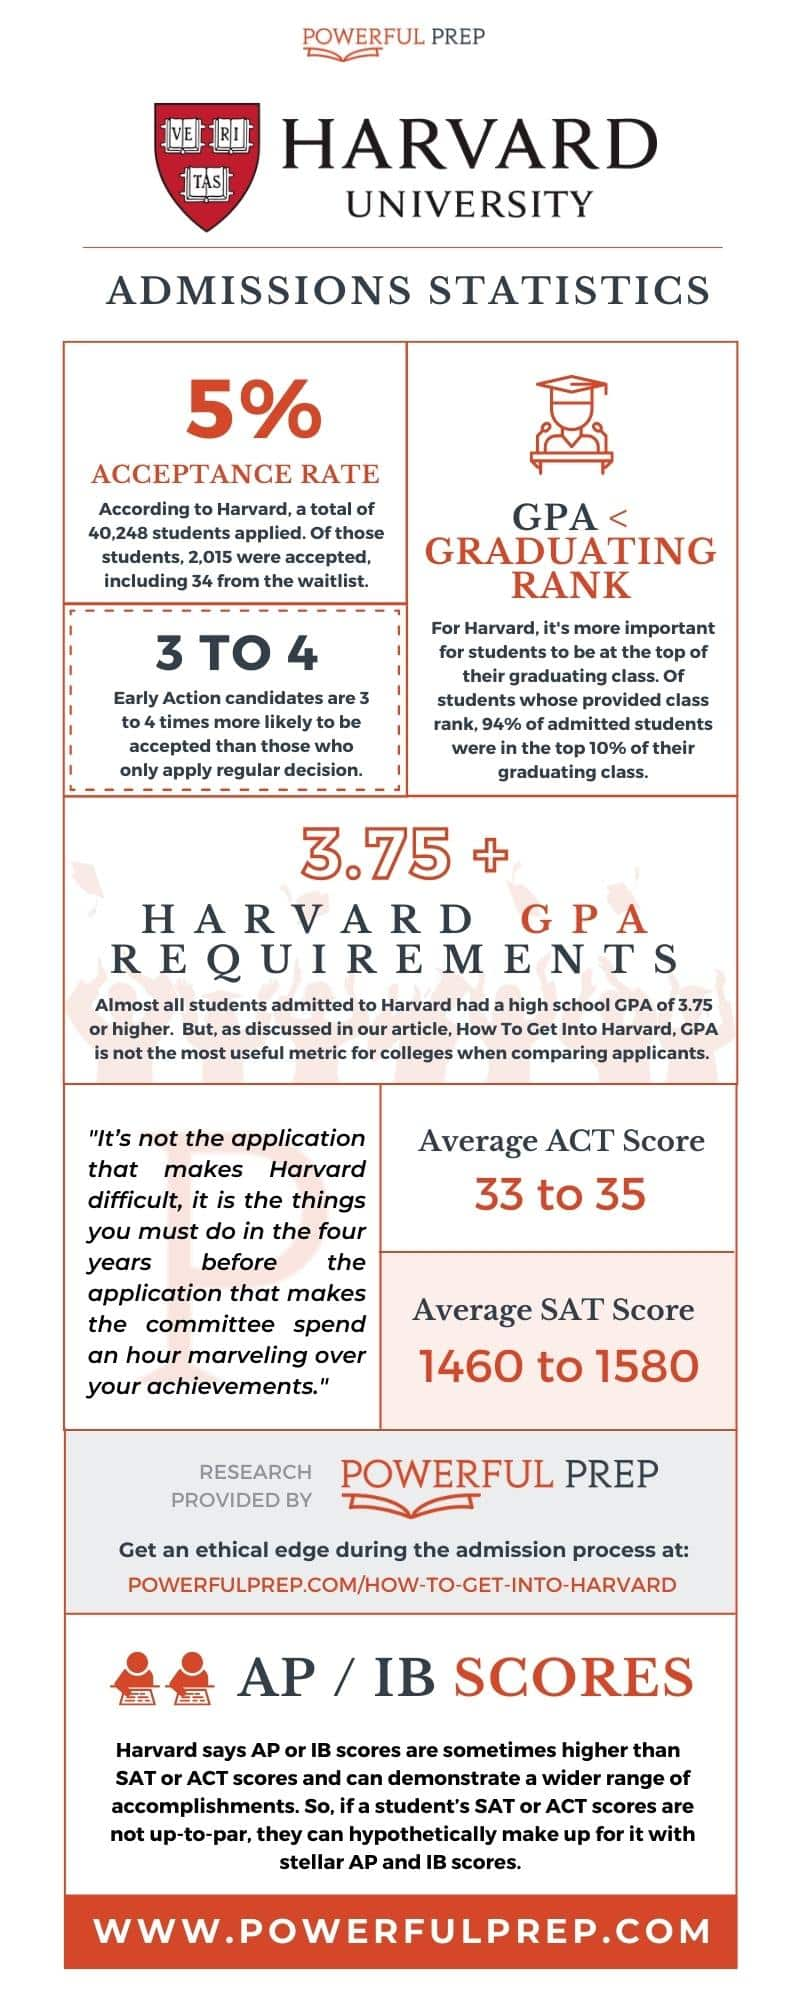 Harvard University Acceptance Rates infographic